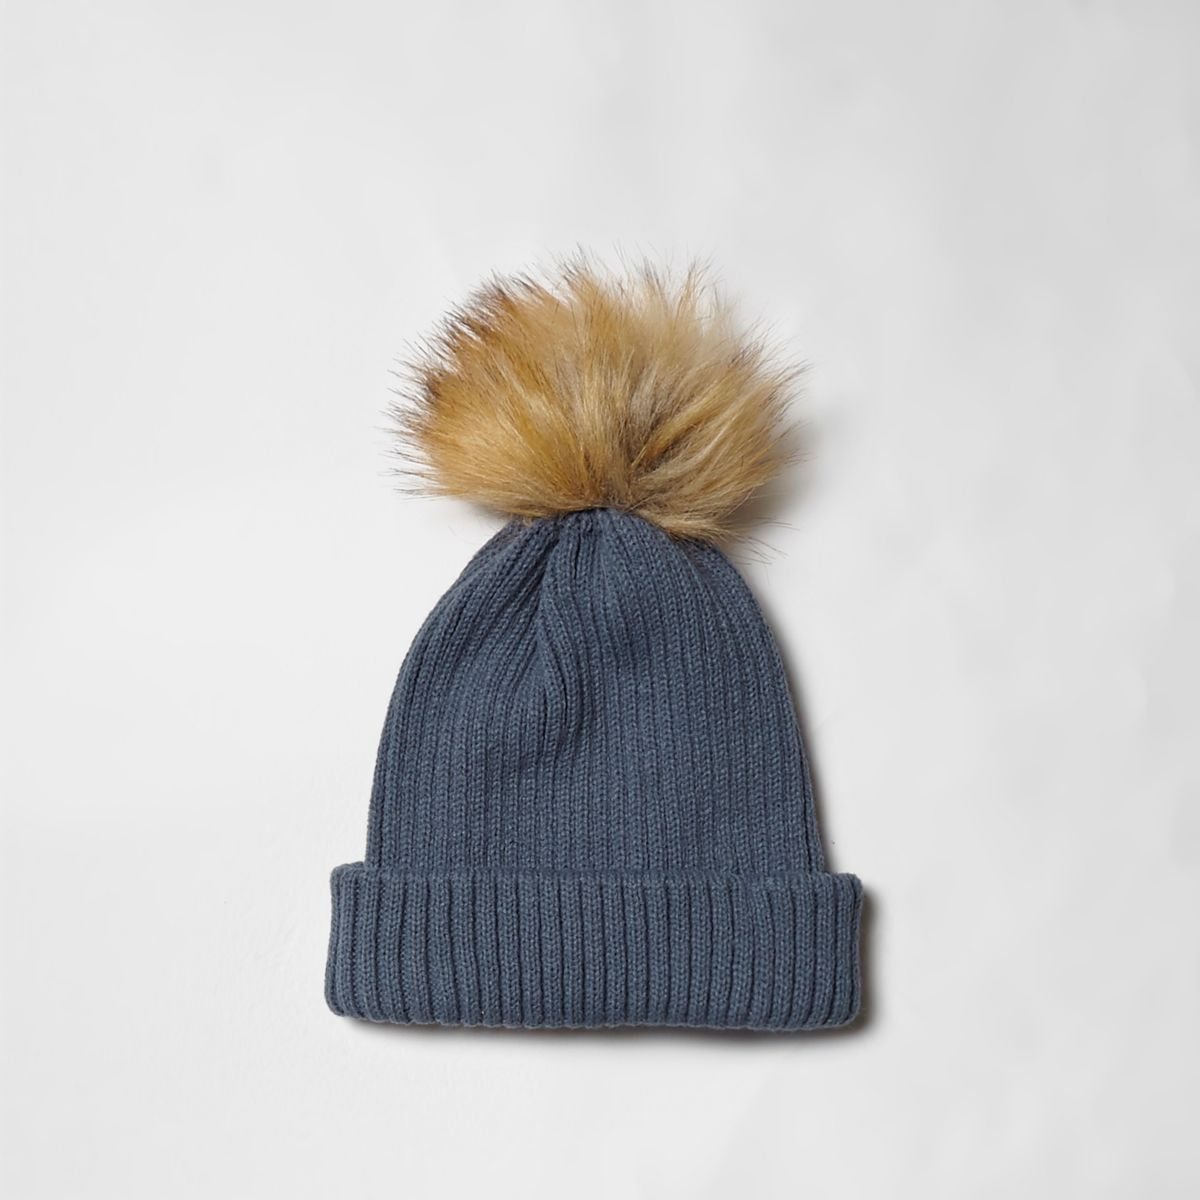 Blue rib knit pom pom bobble beanie hat